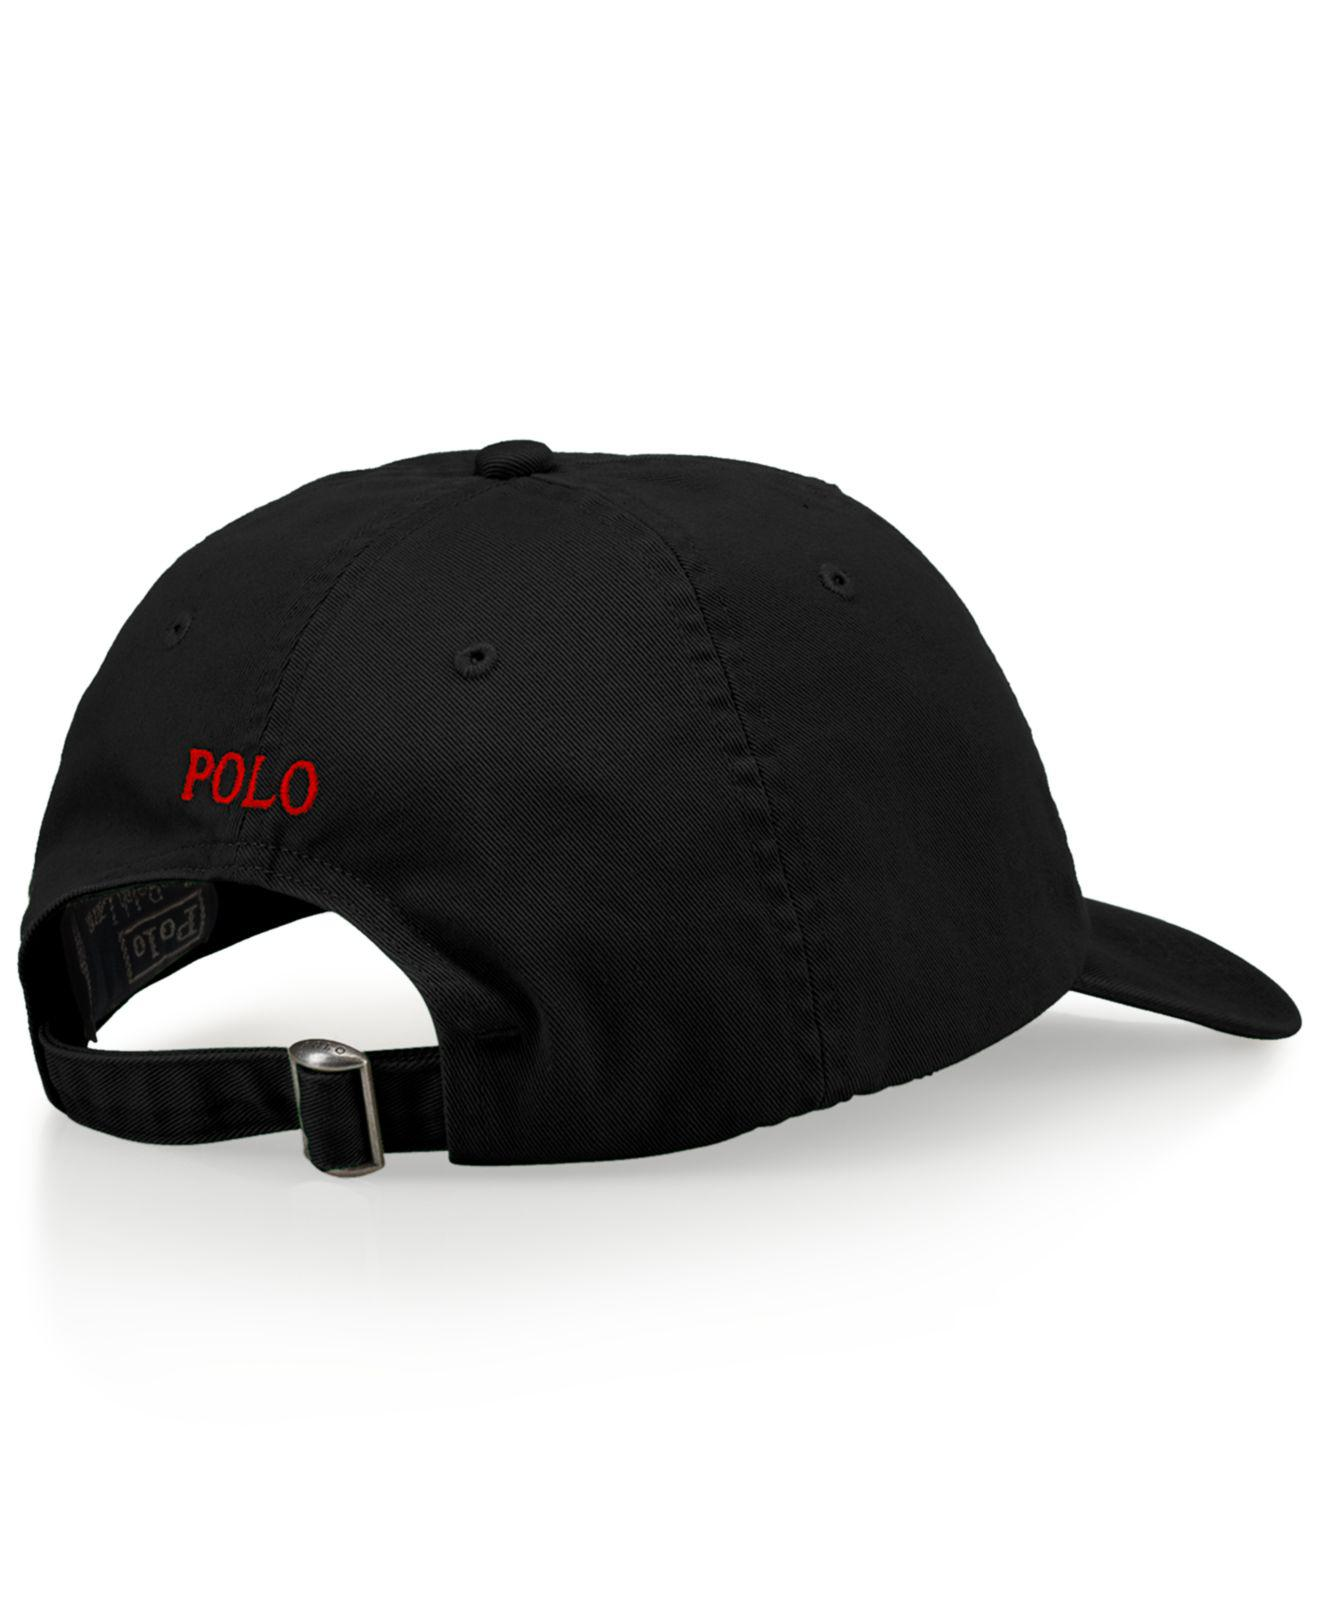 6b0e0cc99d03c Polo Ralph Lauren Classic Sport Cap in Black for Men - Save 33% - Lyst